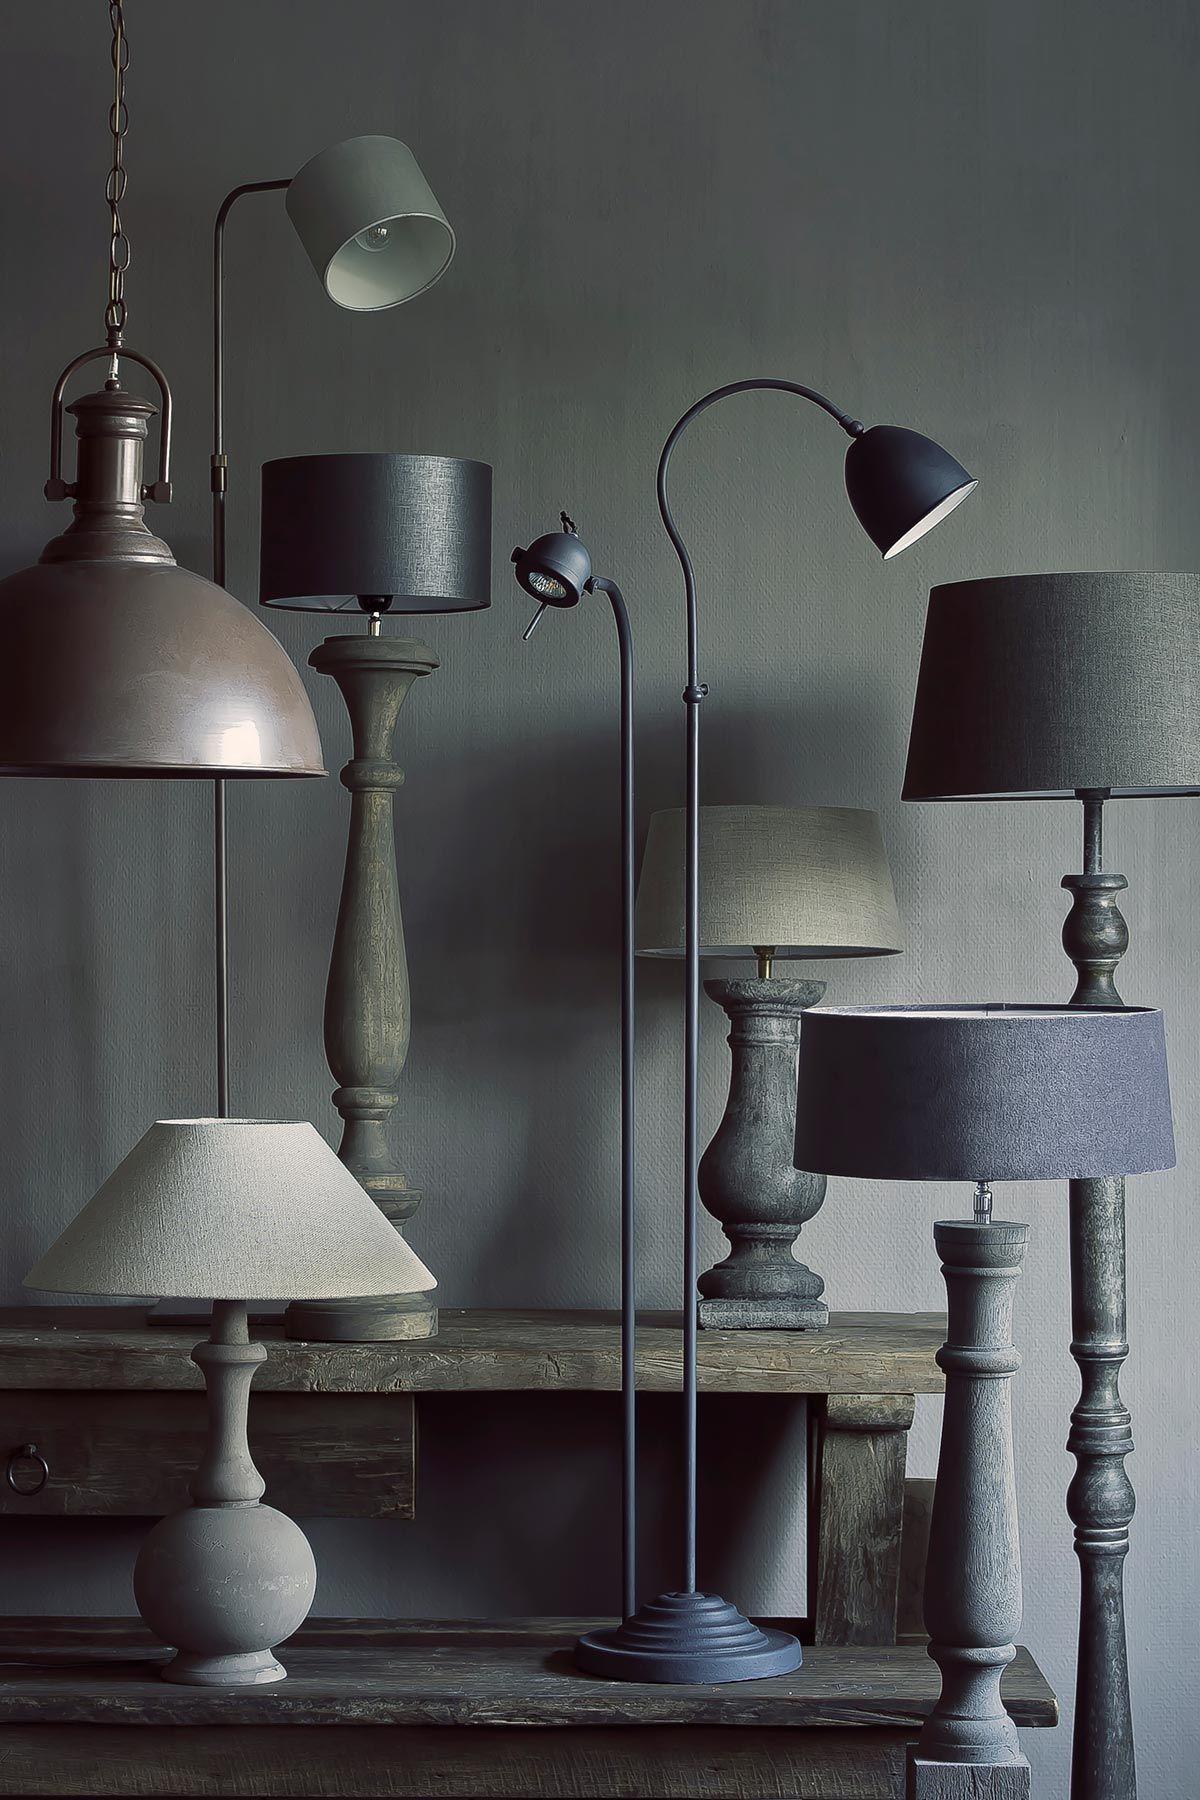 Lampen tierlantijn frezoli hoffz aura peeperkorn for Landelijke lampen